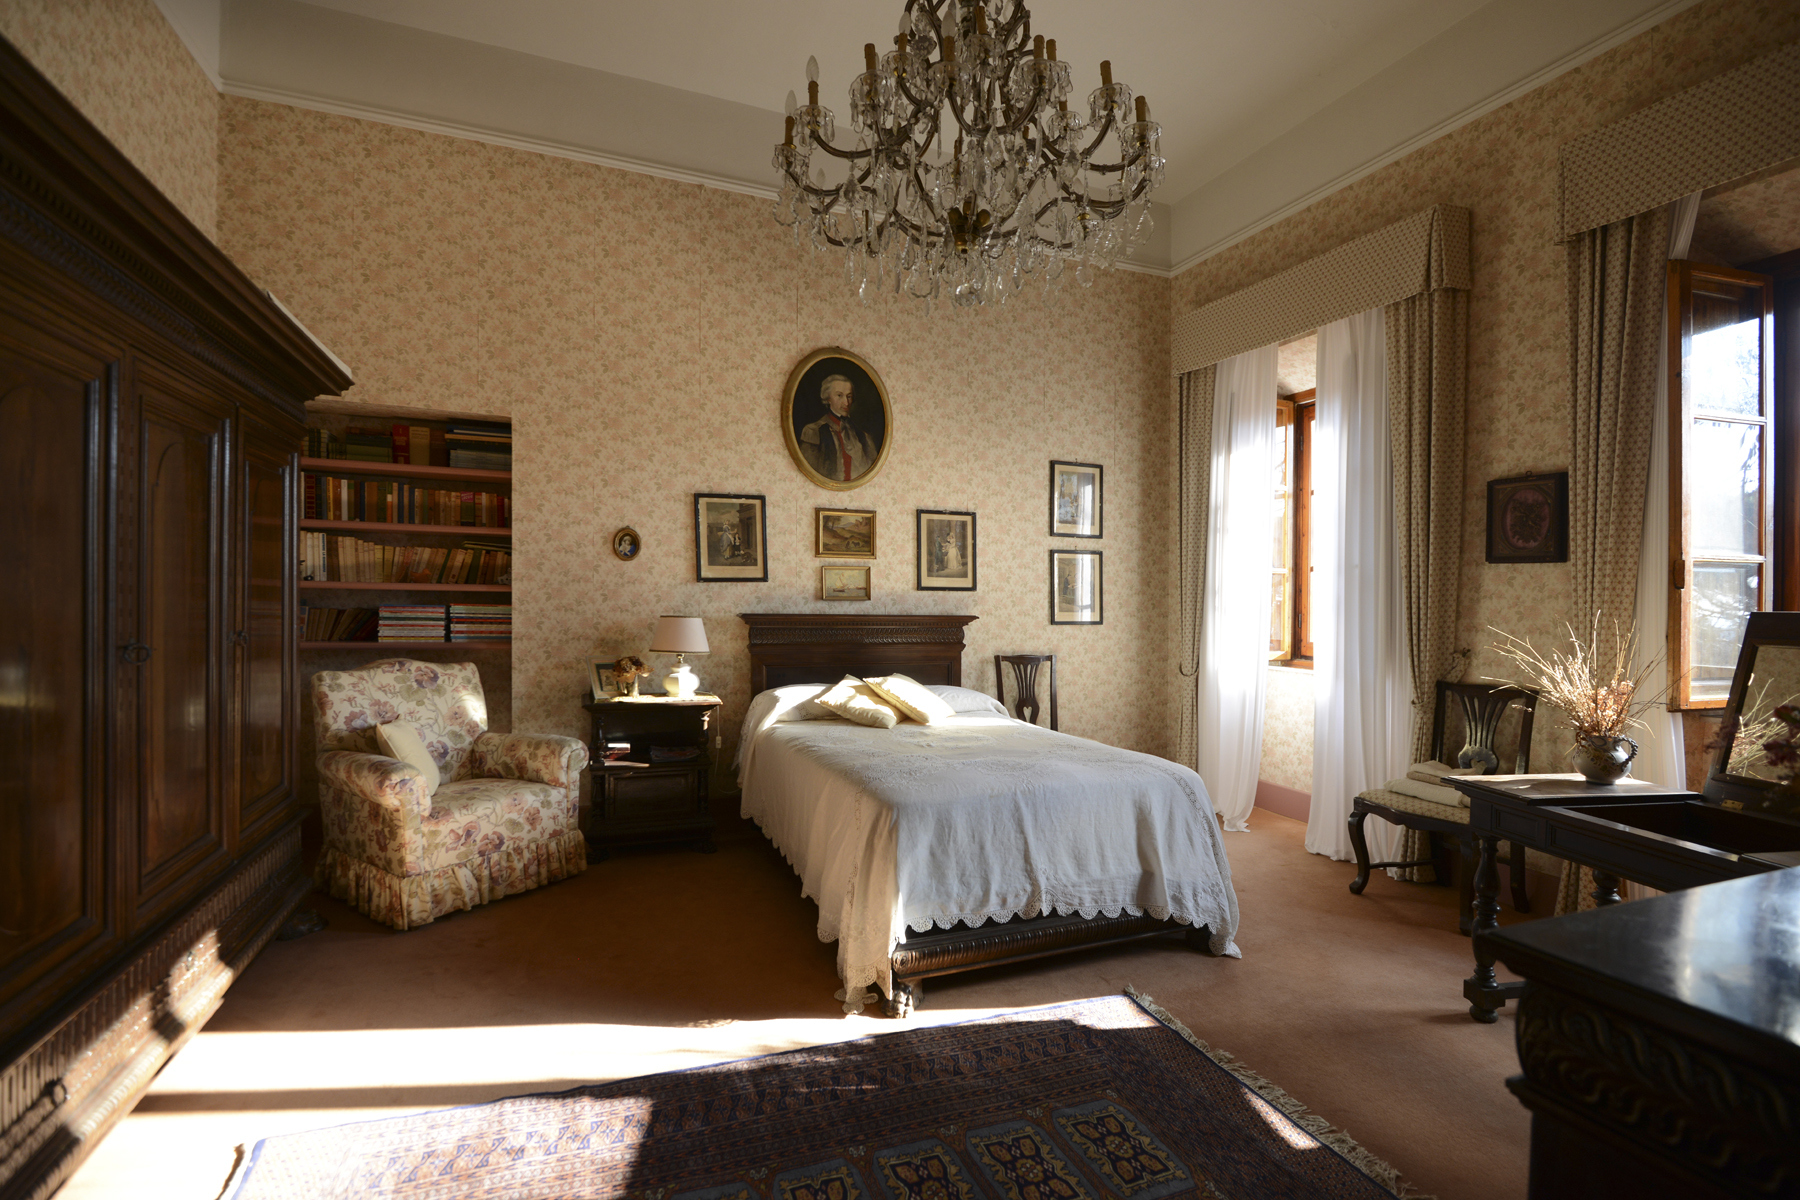 Villa in Vendita a Casciana Terme Lari: 5 locali, 1800 mq - Foto 22